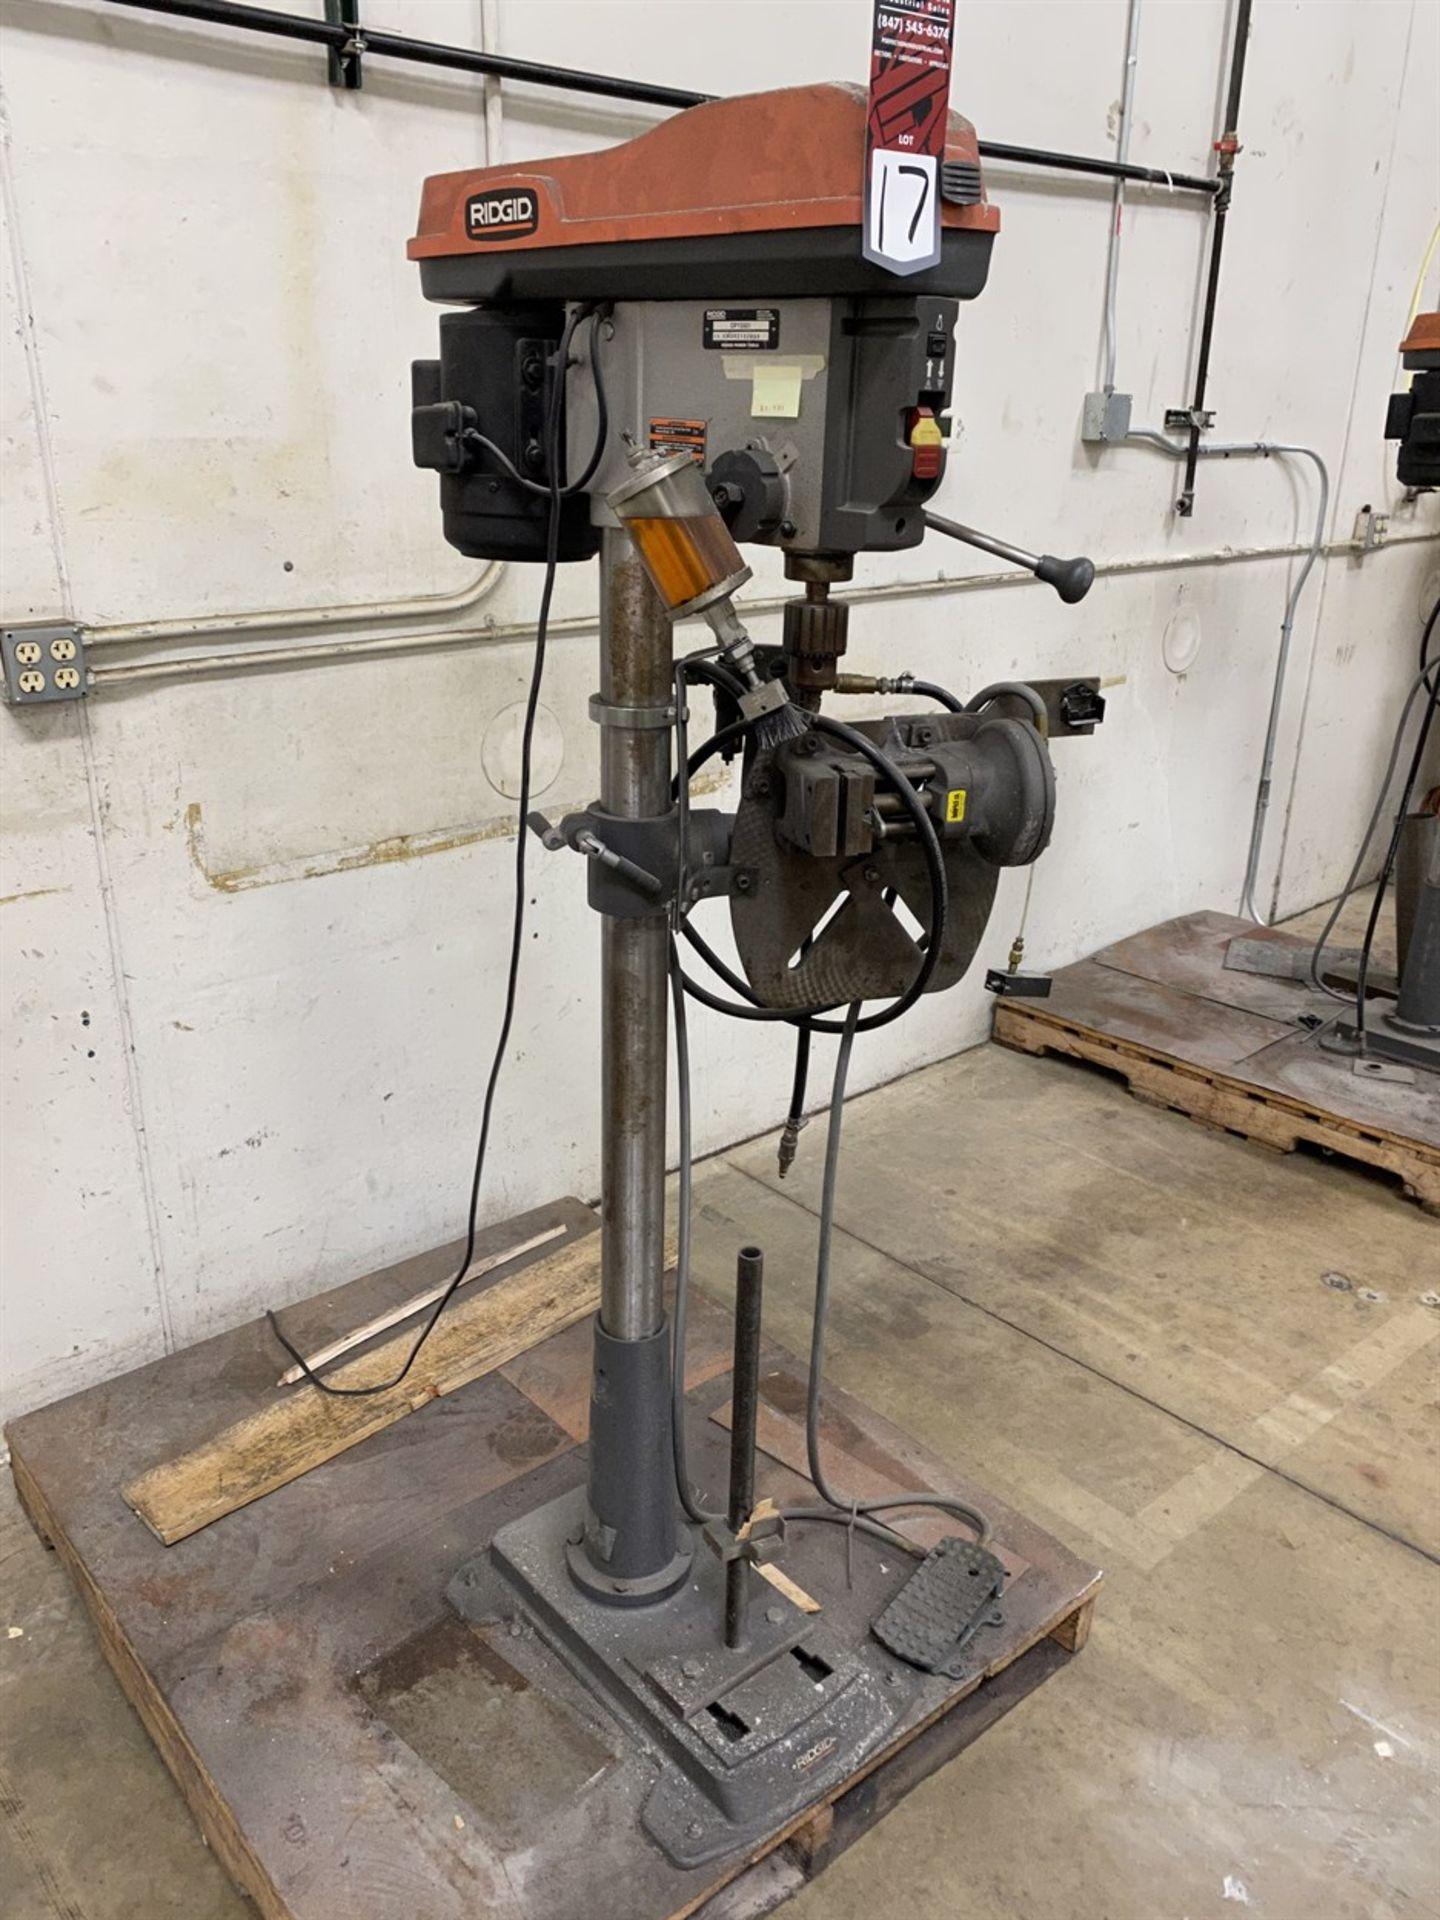 Lot 17 - RIDGID DP15501 Drill Press, s/n AM062152880, w/ Heinrich Pneumatic Vise